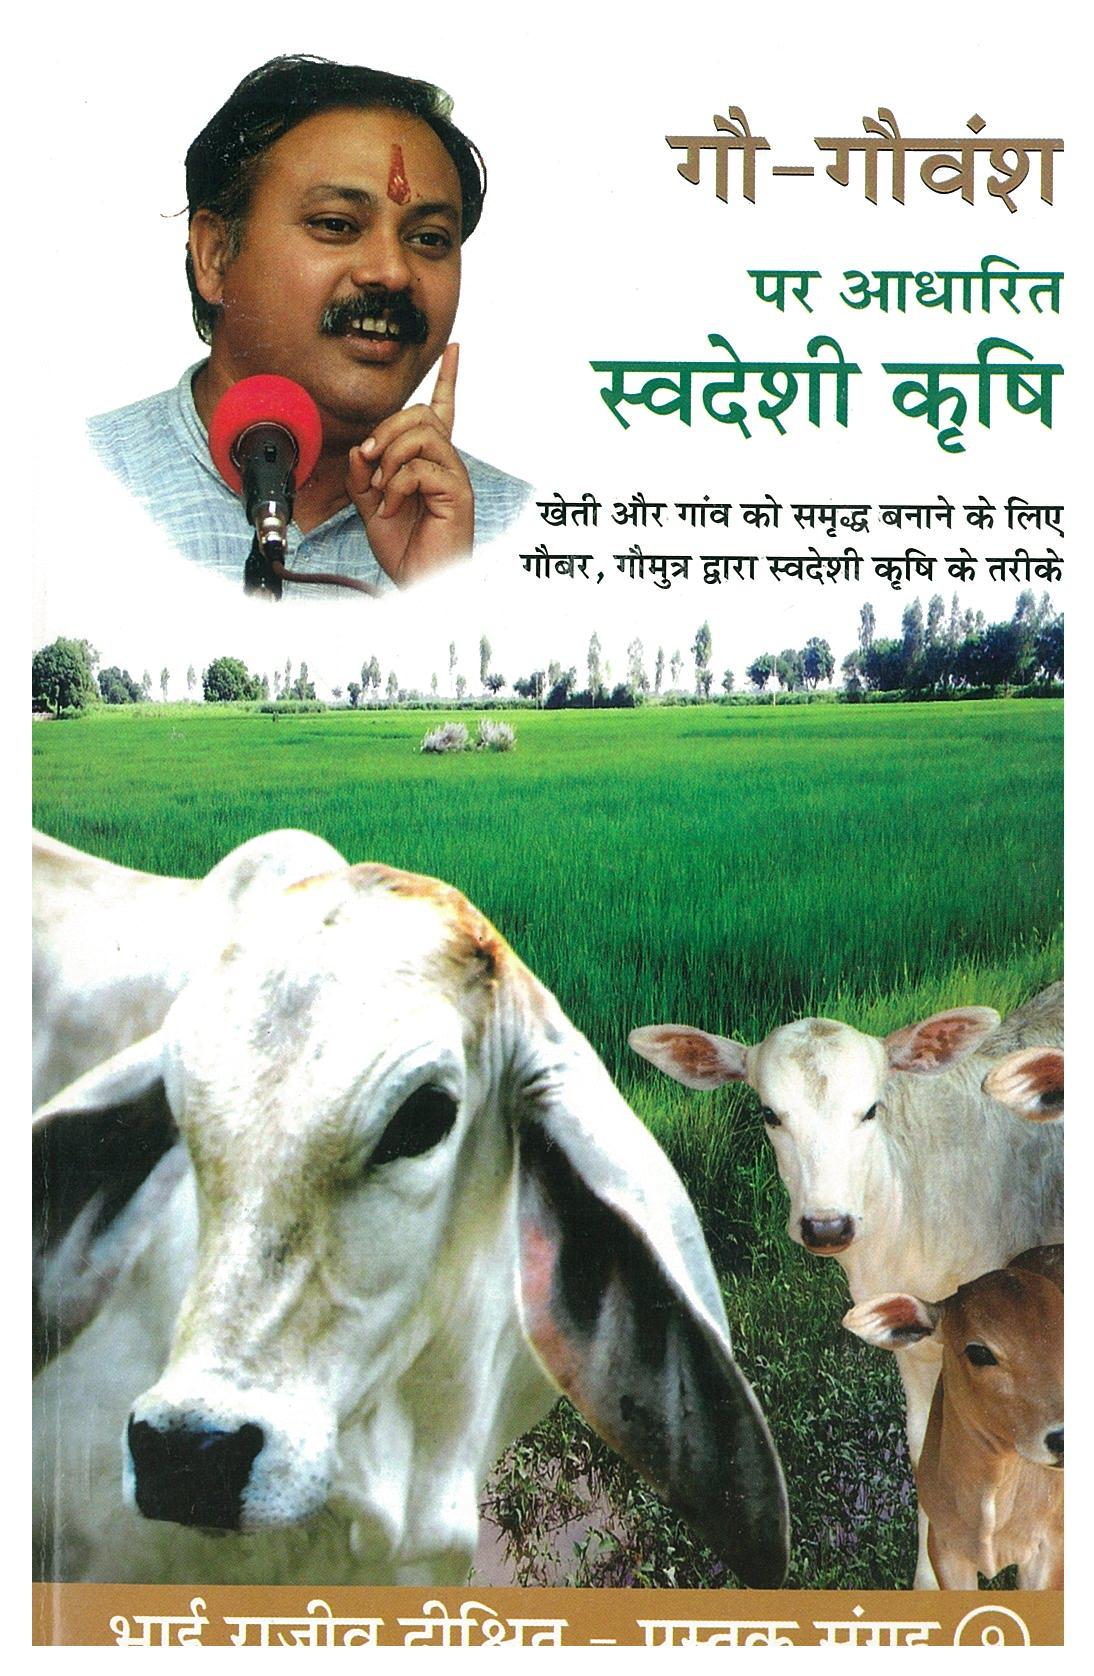 गौ-गौवंश आधारित स्वदेशी कृषि